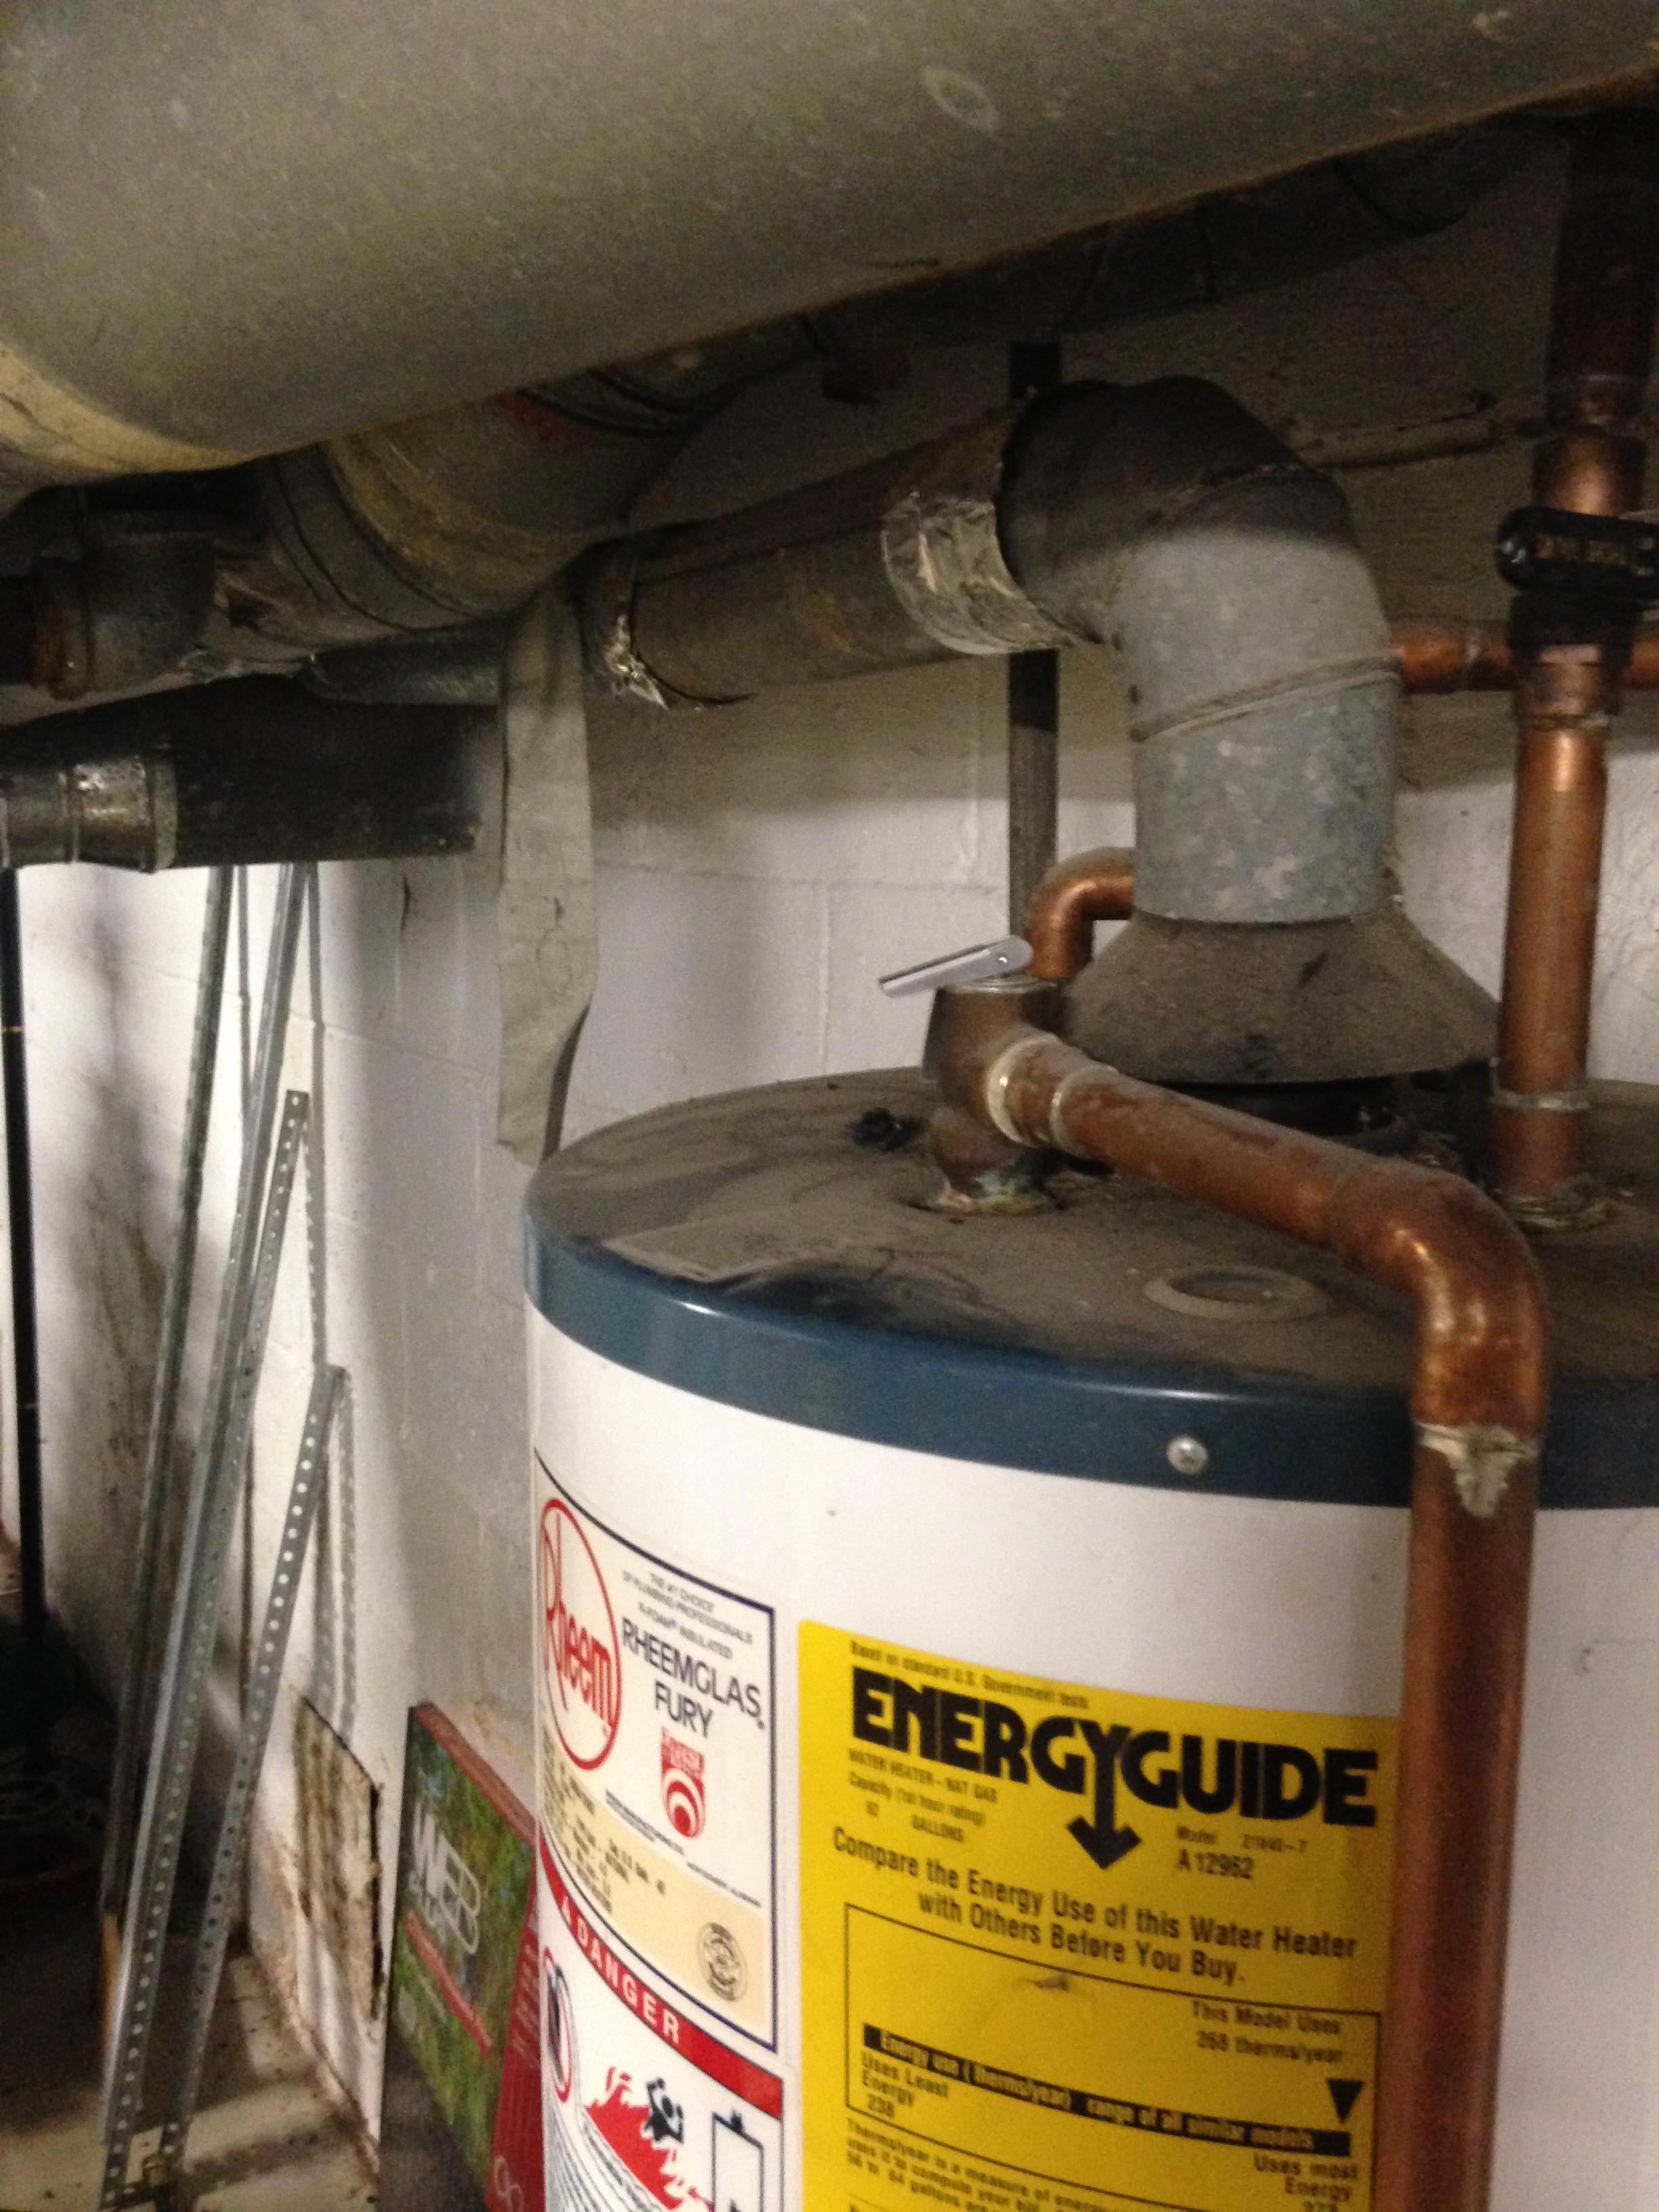 installing gas water heater water heater installation wiring diagram gas water heater installation requirements vidim wiring diagram